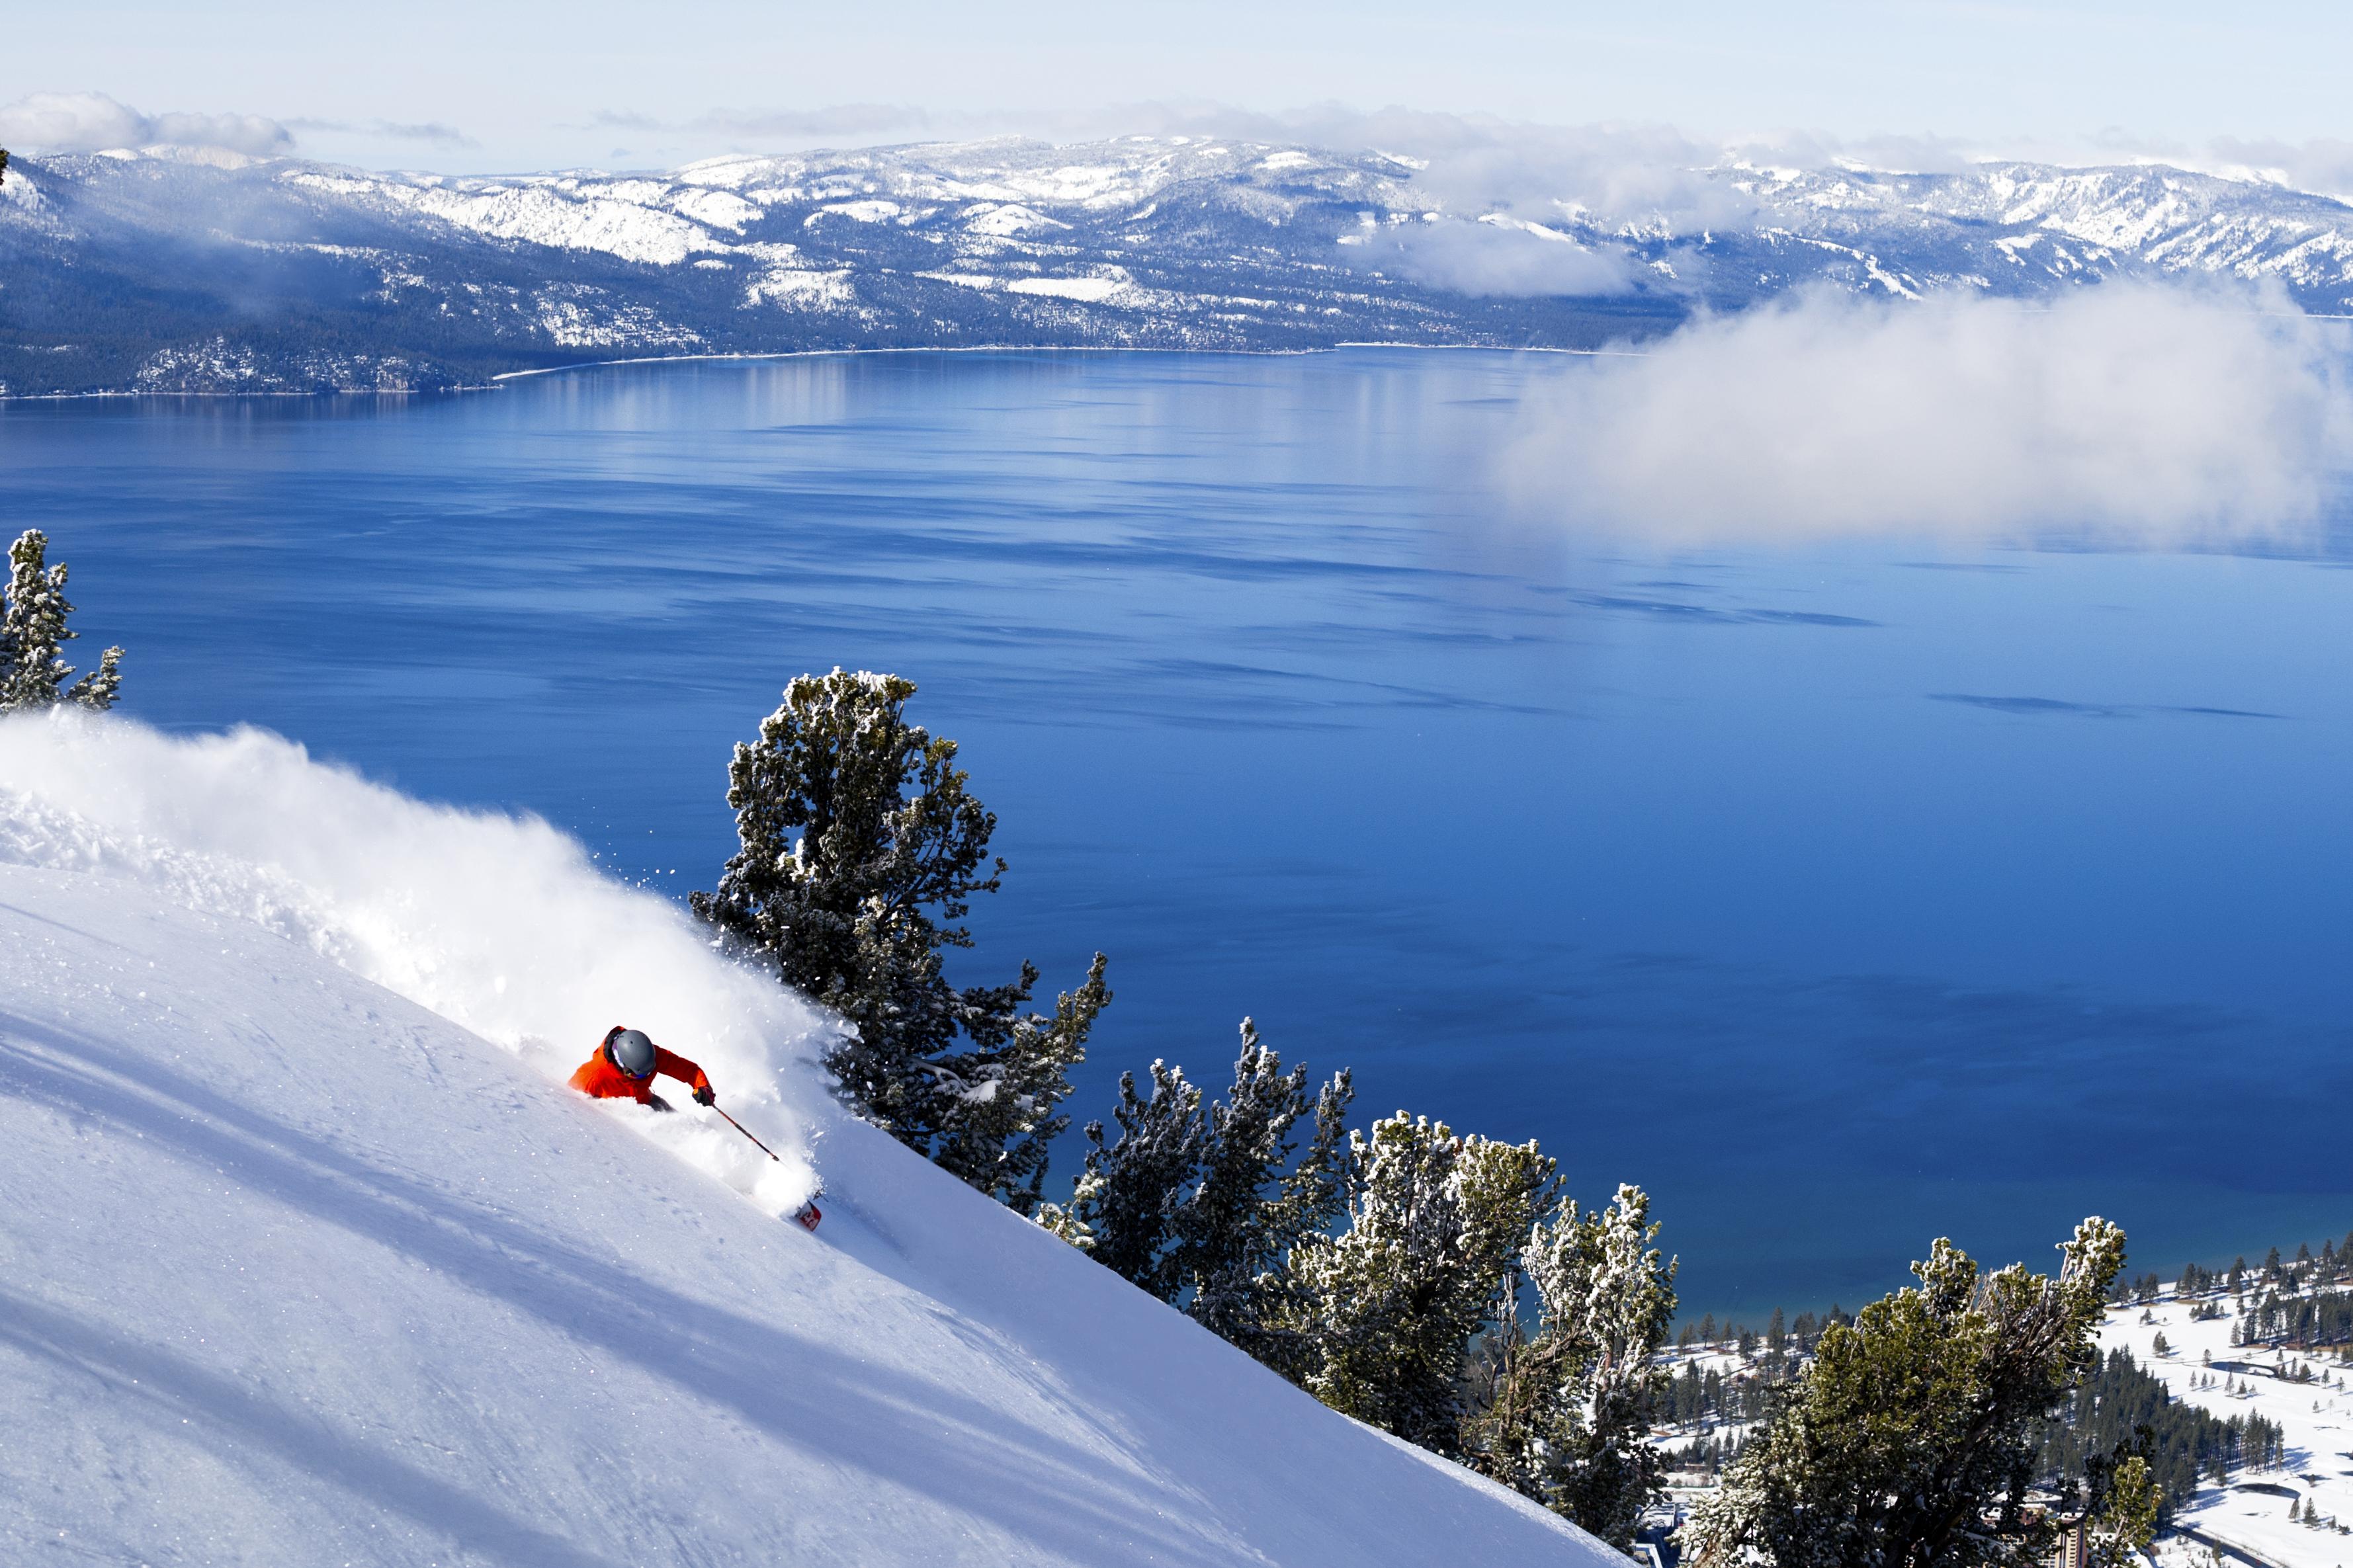 171207-Heavenly-South-Lake-California